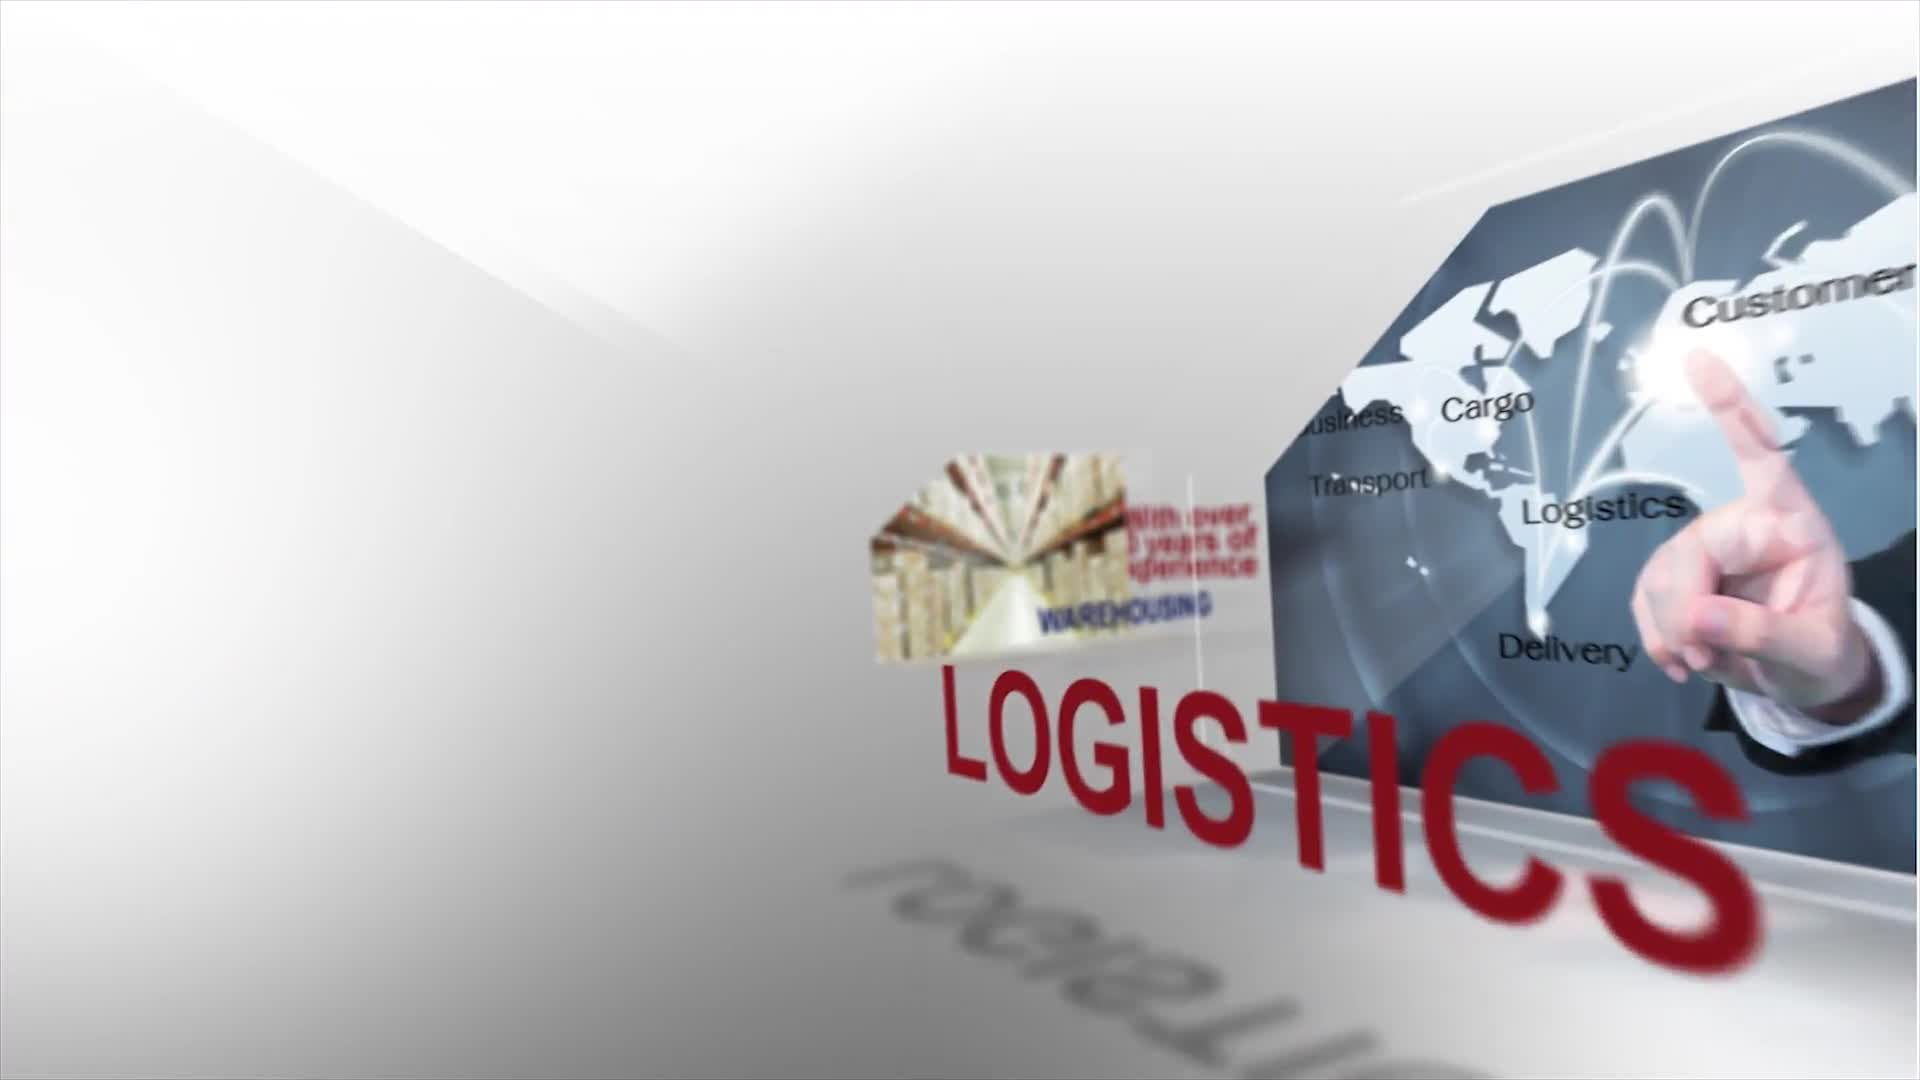 ByExpress Logistics & Transportation - Transportation Service - 613-739-3000